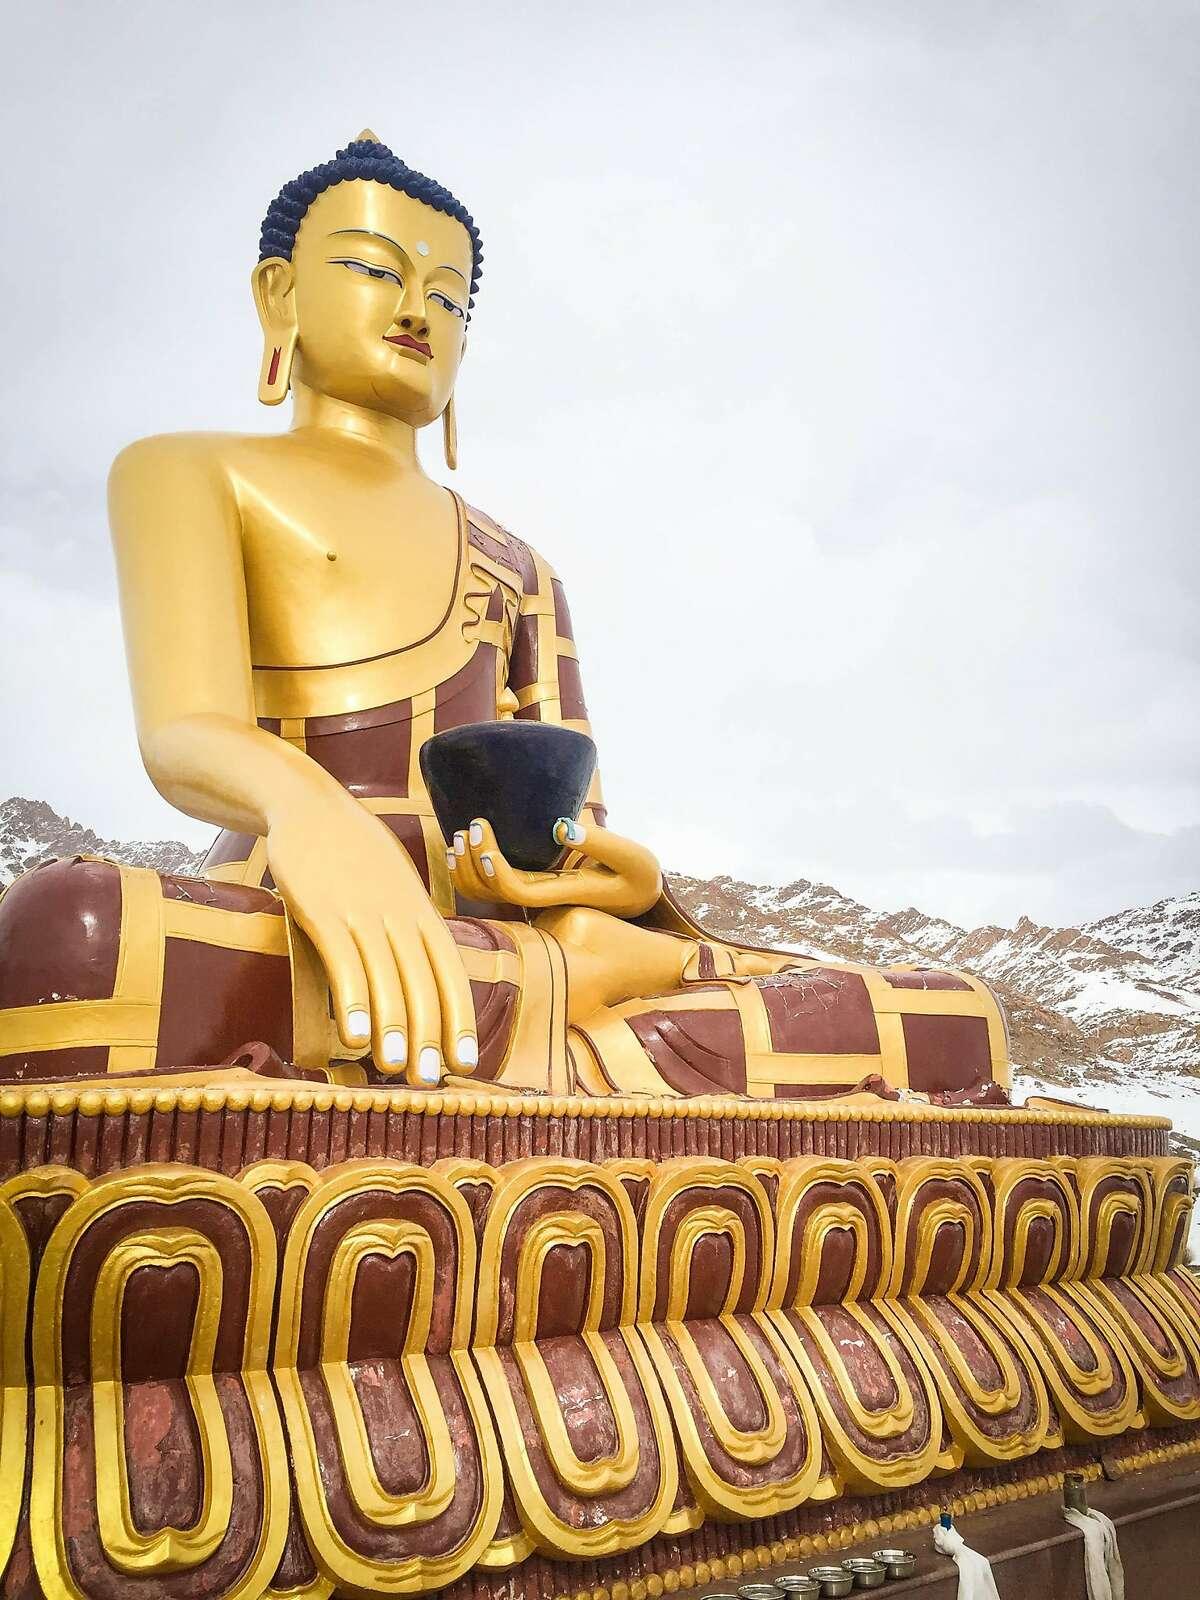 A giant, golden Buddha tops a hill in Hemis Shukpachan.